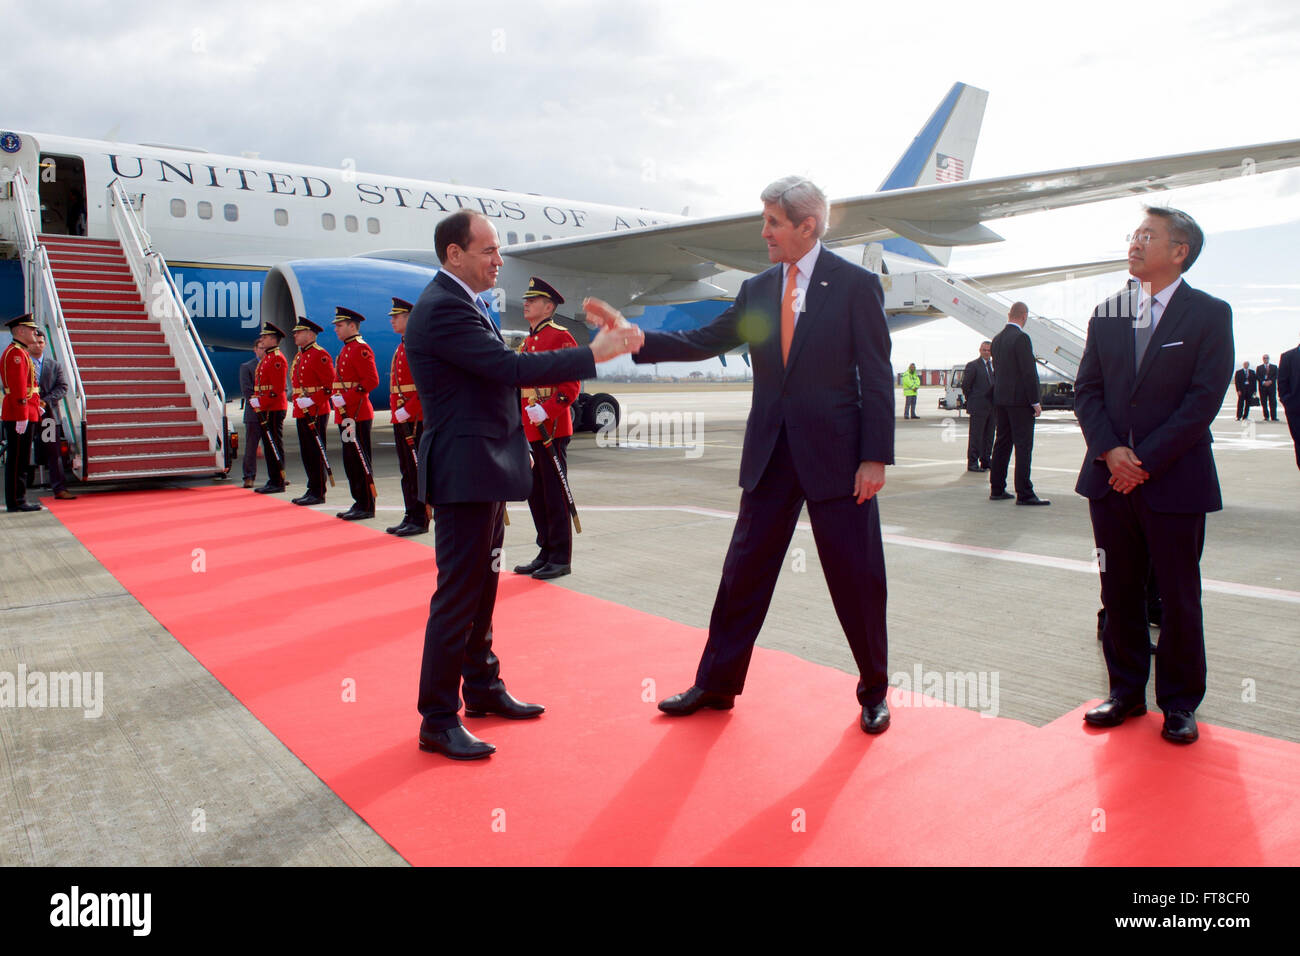 U.S. Secretary of State John Kerry, flanked by U.S. Ambassador to Albania Donald Lu, bids farewell to Albanian President - Stock Image